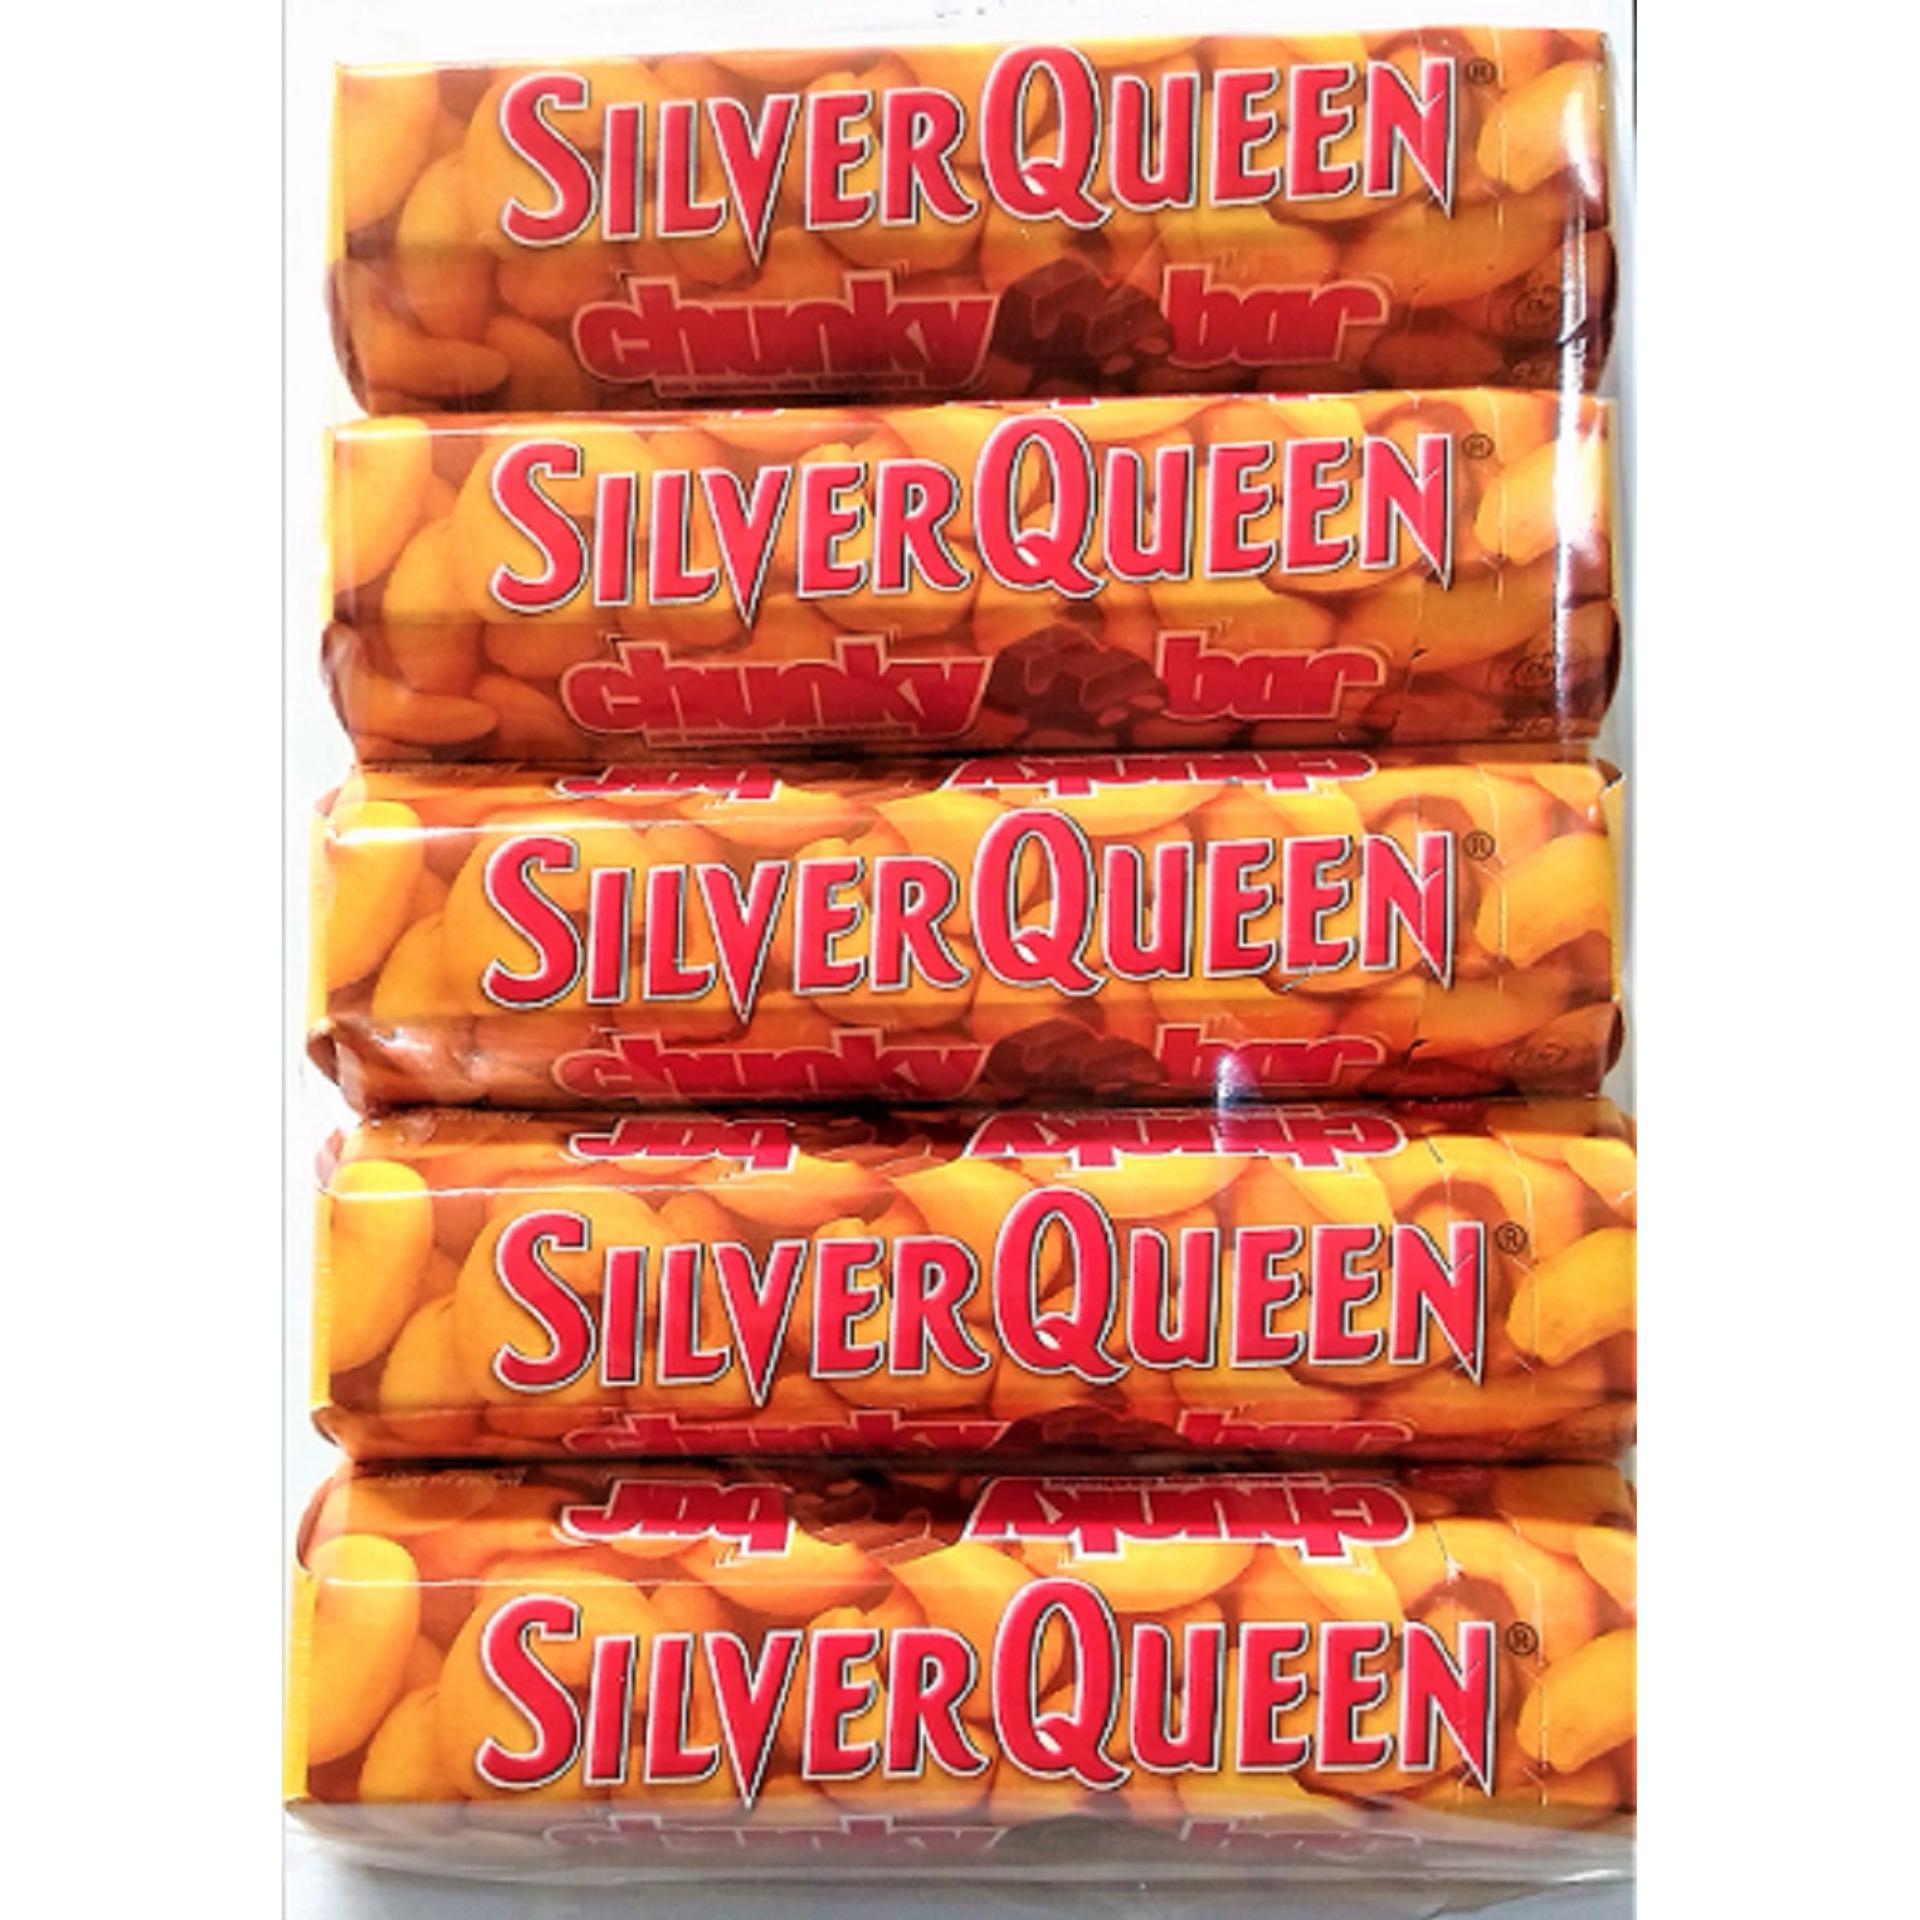 Review of Delfi Silverqueen Chunky Bar 5 pcs belanja murah - Hanya Rp38.640